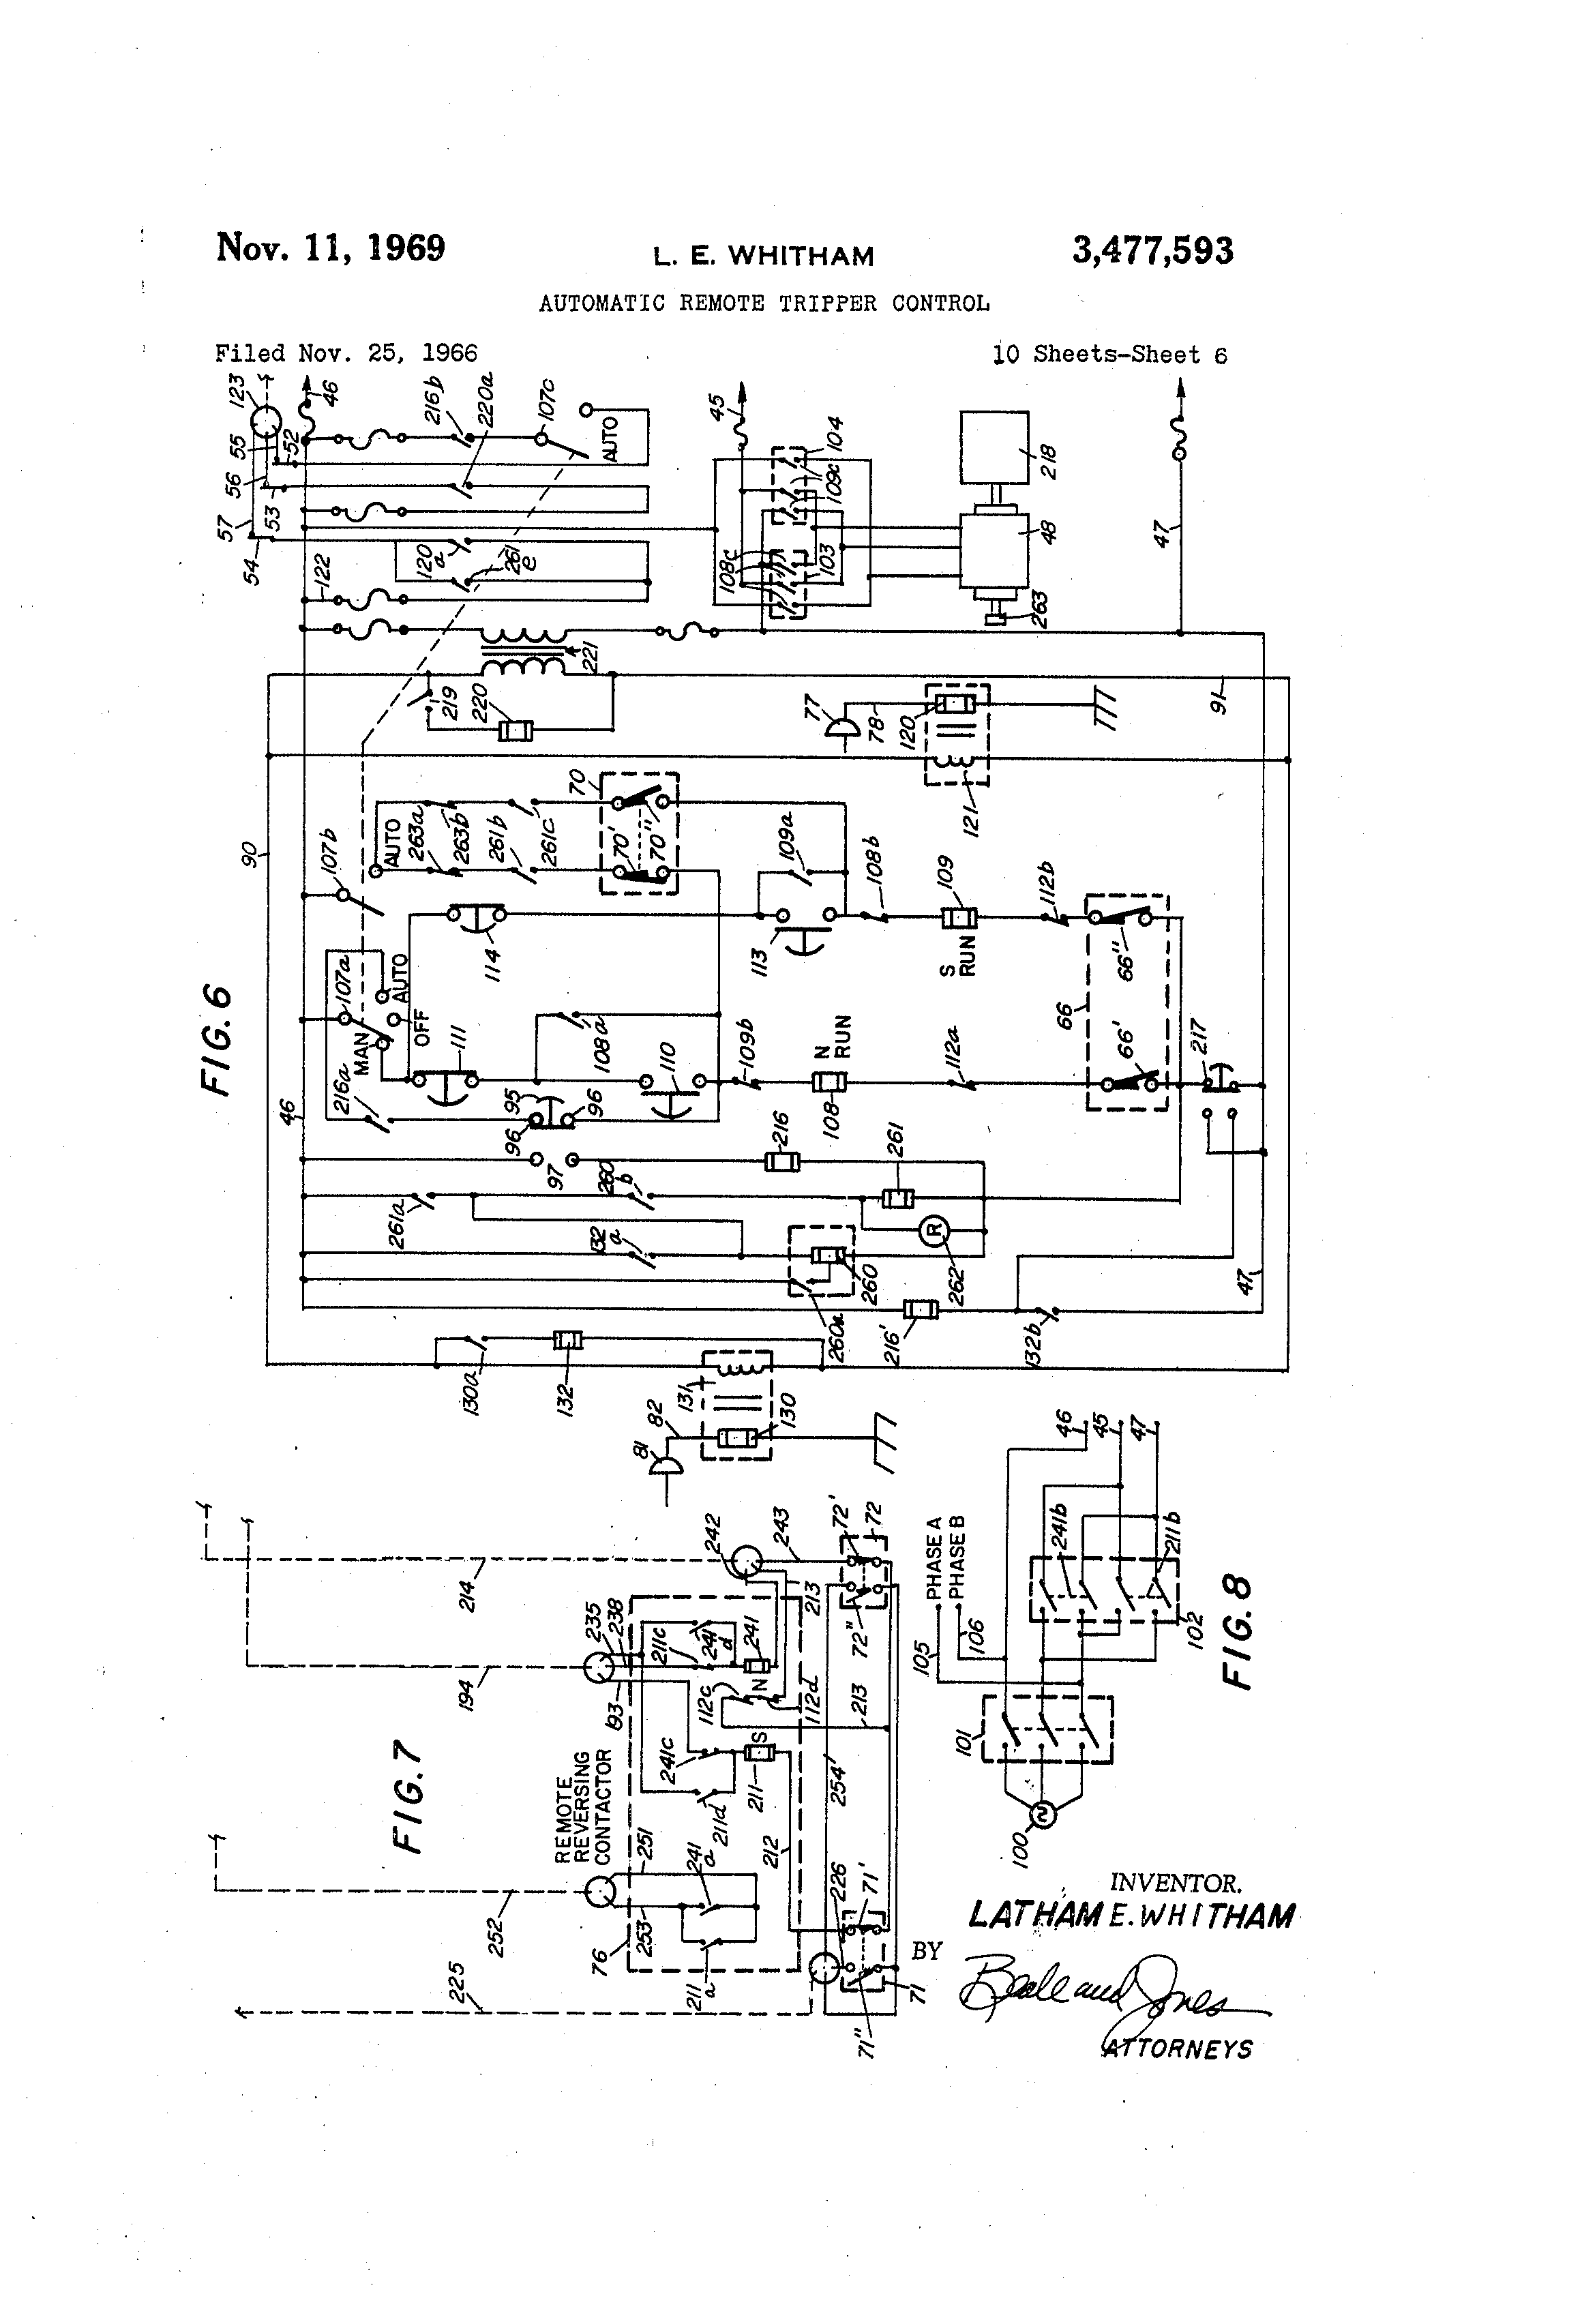 SN_8477] Wiring Diagram For Lennox 89N18 Schematic WiringIcism Nowa Hylec Ling Proe Hison Ospor Tool Tixat Mohammedshrine Librar  Wiring 101